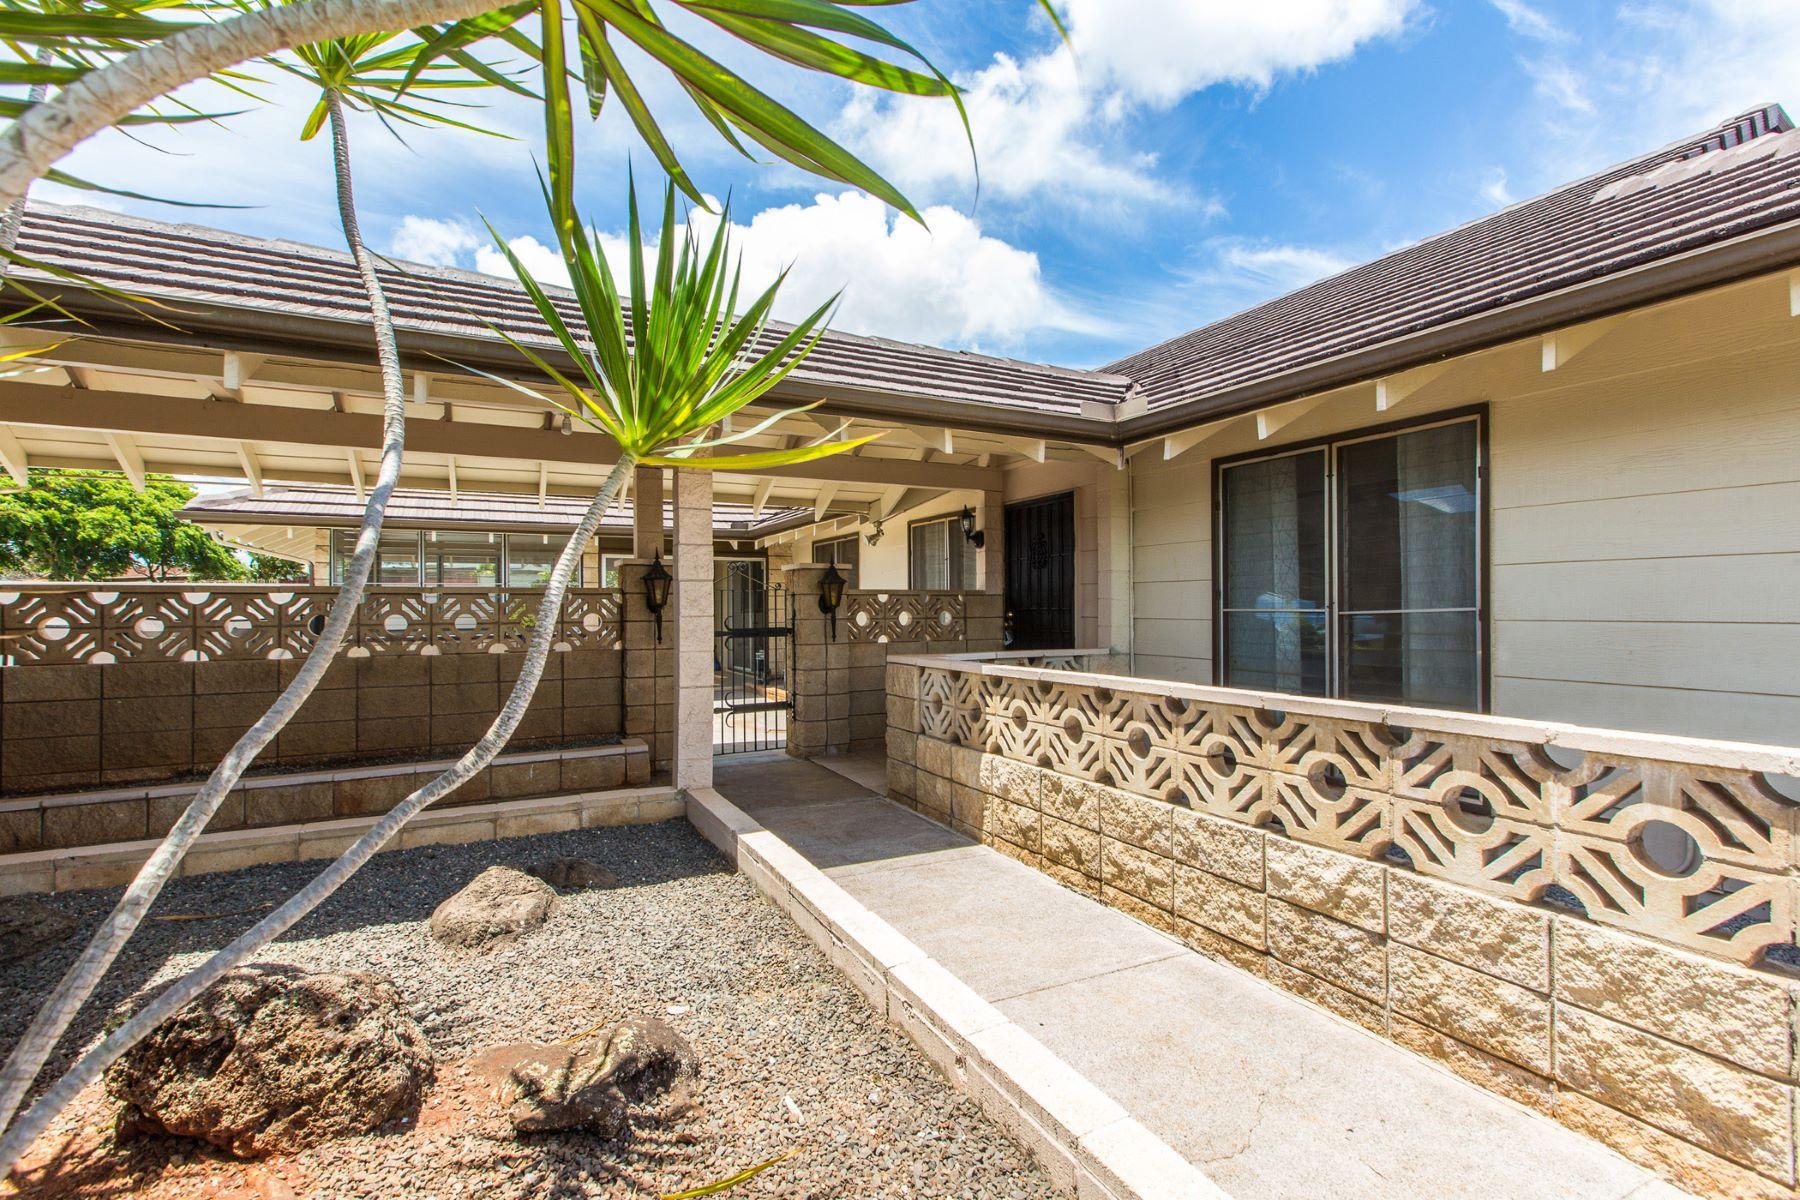 Single Family Home for Sale at Remodeled Mililani 95-201 Kahiku Pl Mililani, Hawaii 96789 United States